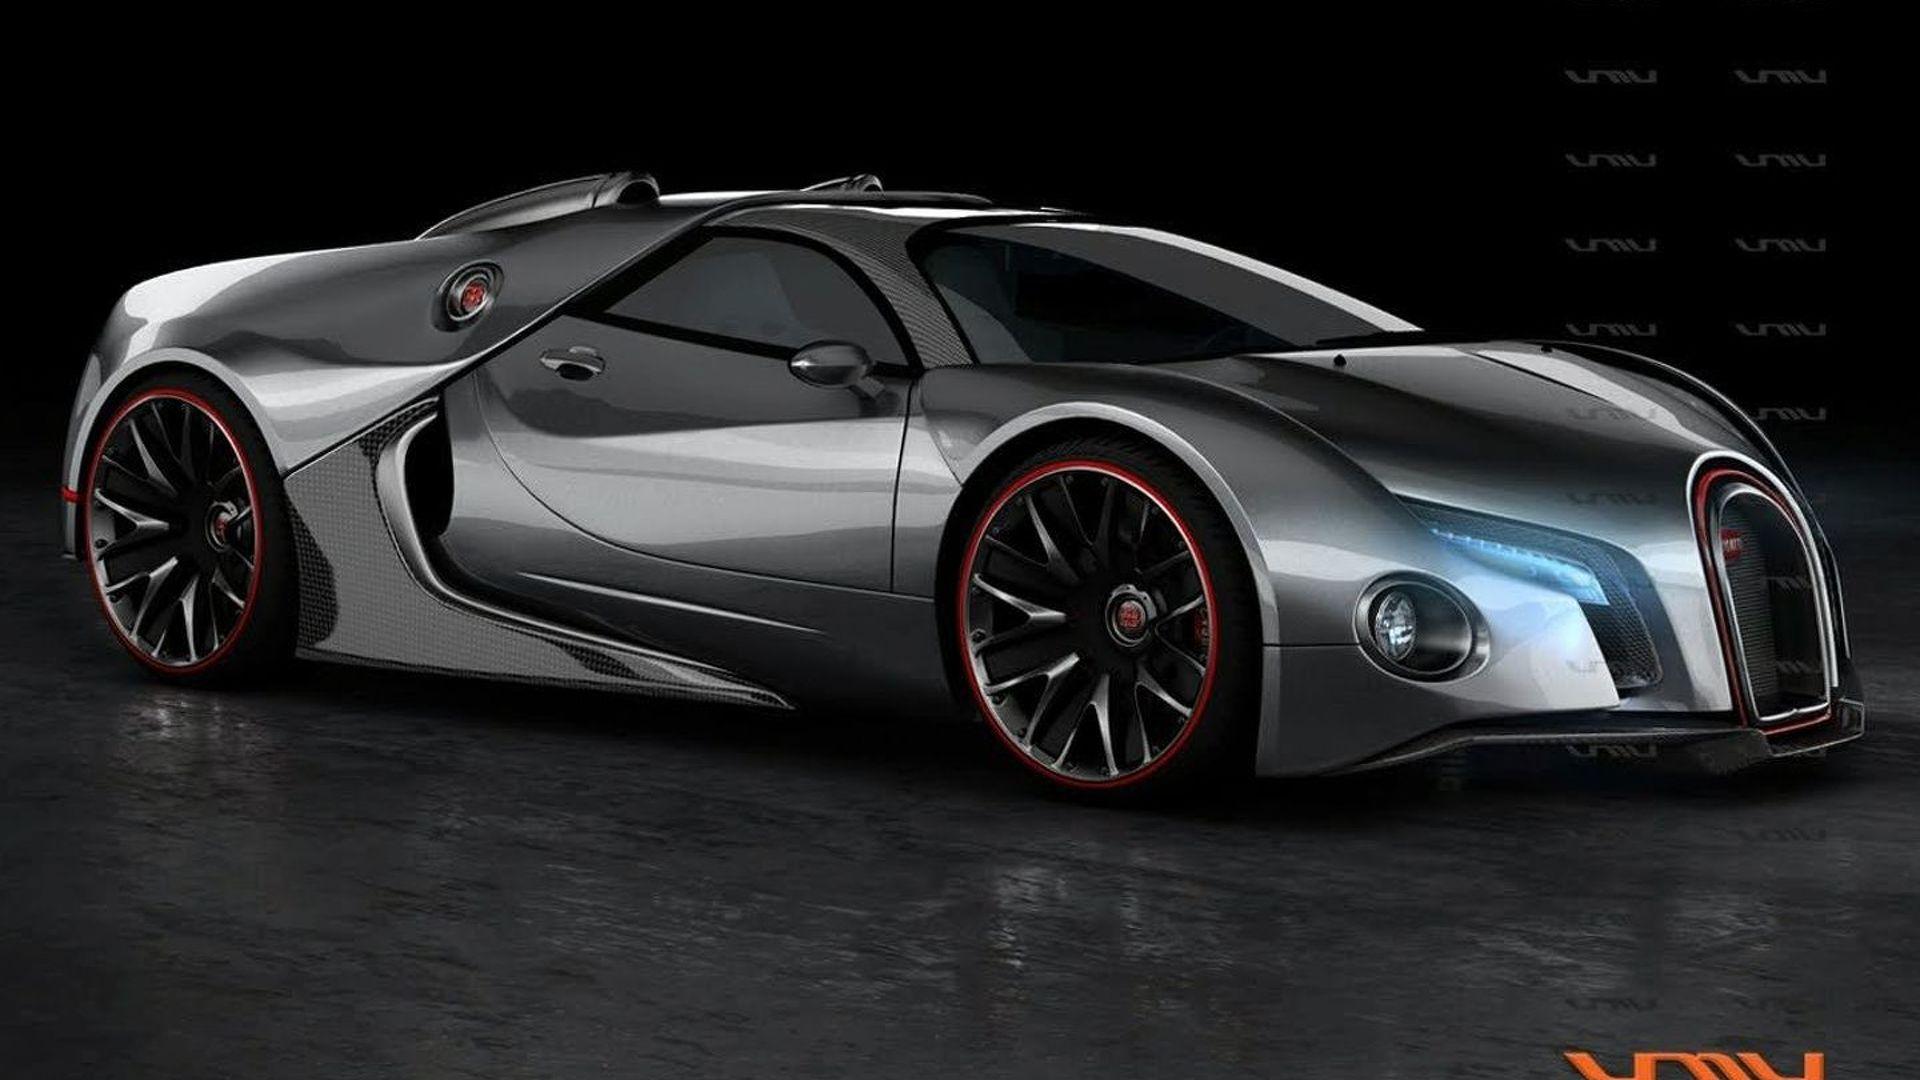 New Bugatti Veyron to top 1200hp